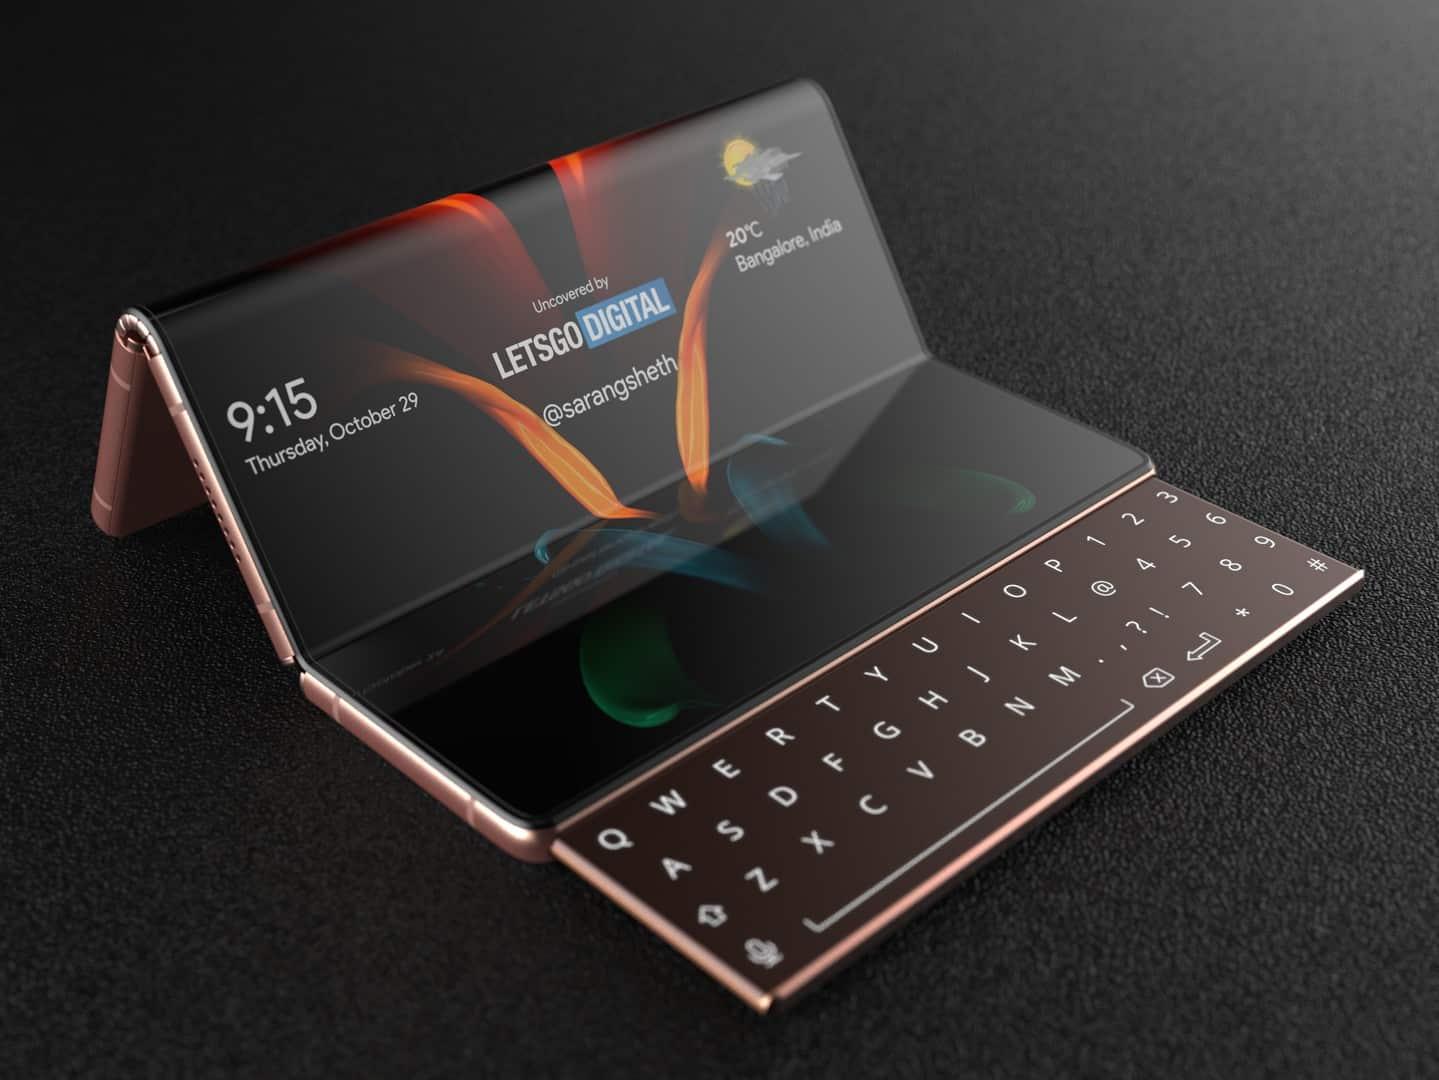 Samsung Galaxy Z Fold with sliding keyboard 4